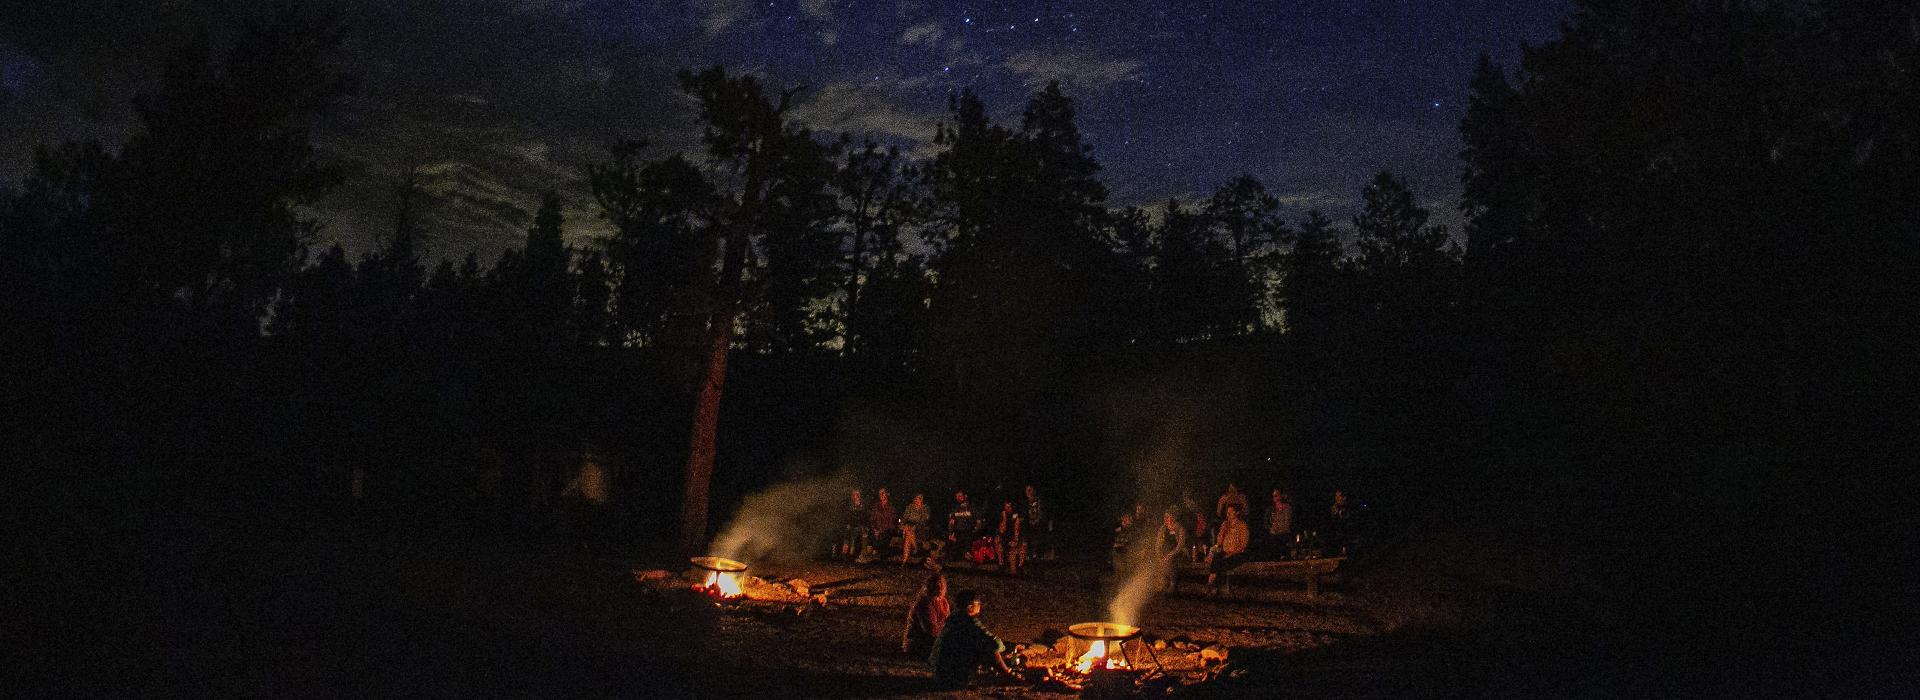 Camp Shady Brook Campfire